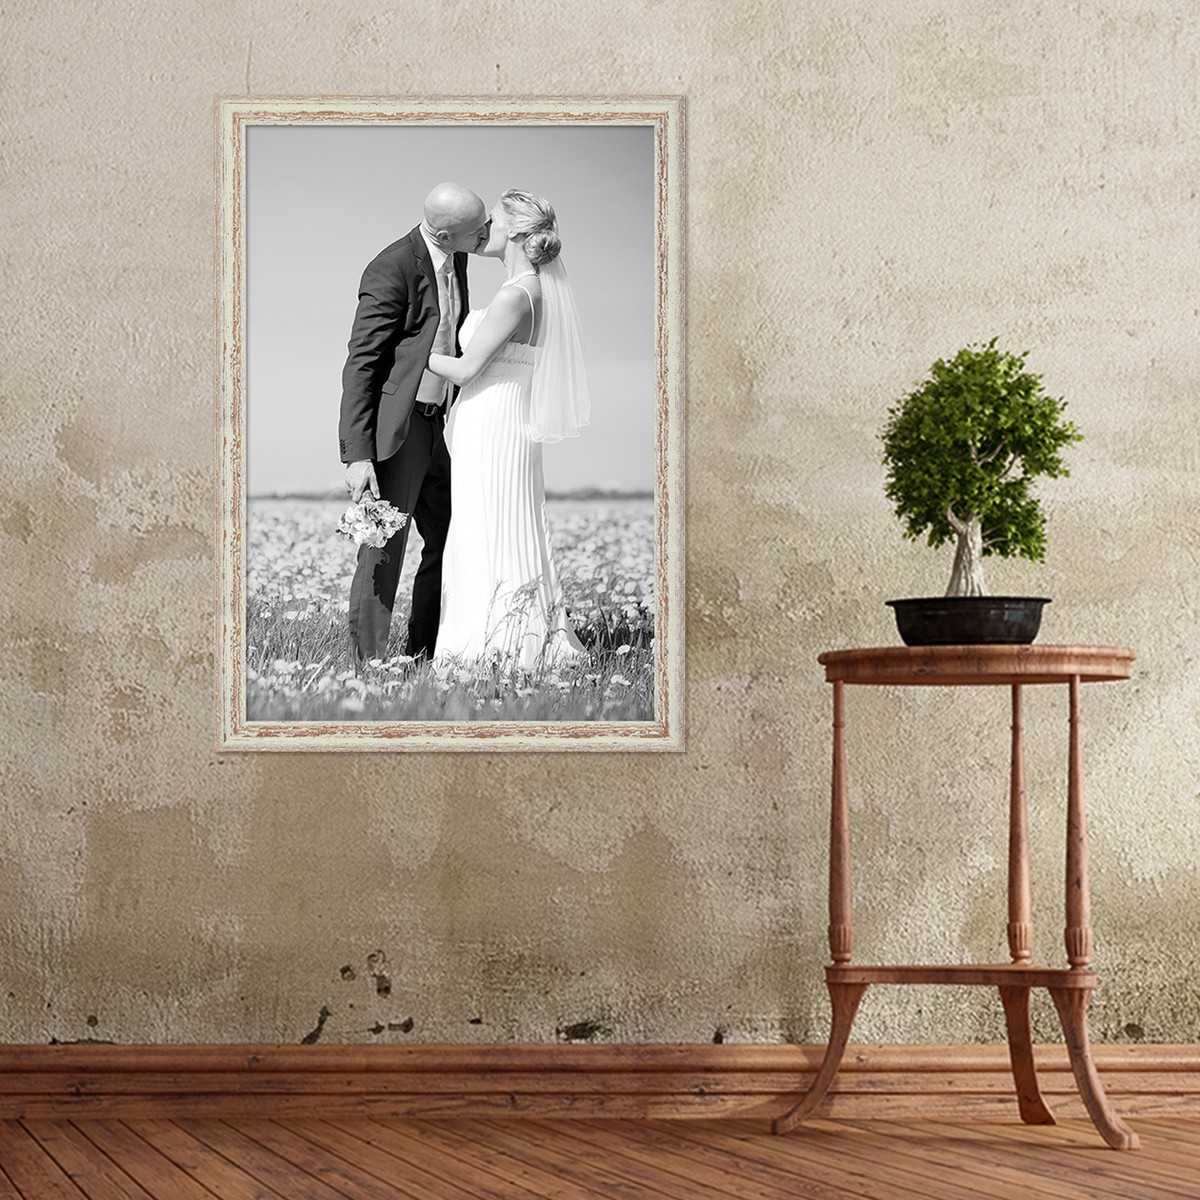 Vintage Bilderrahmen 50x70 cm Weiss Shabby-Chic Massivholz m ...